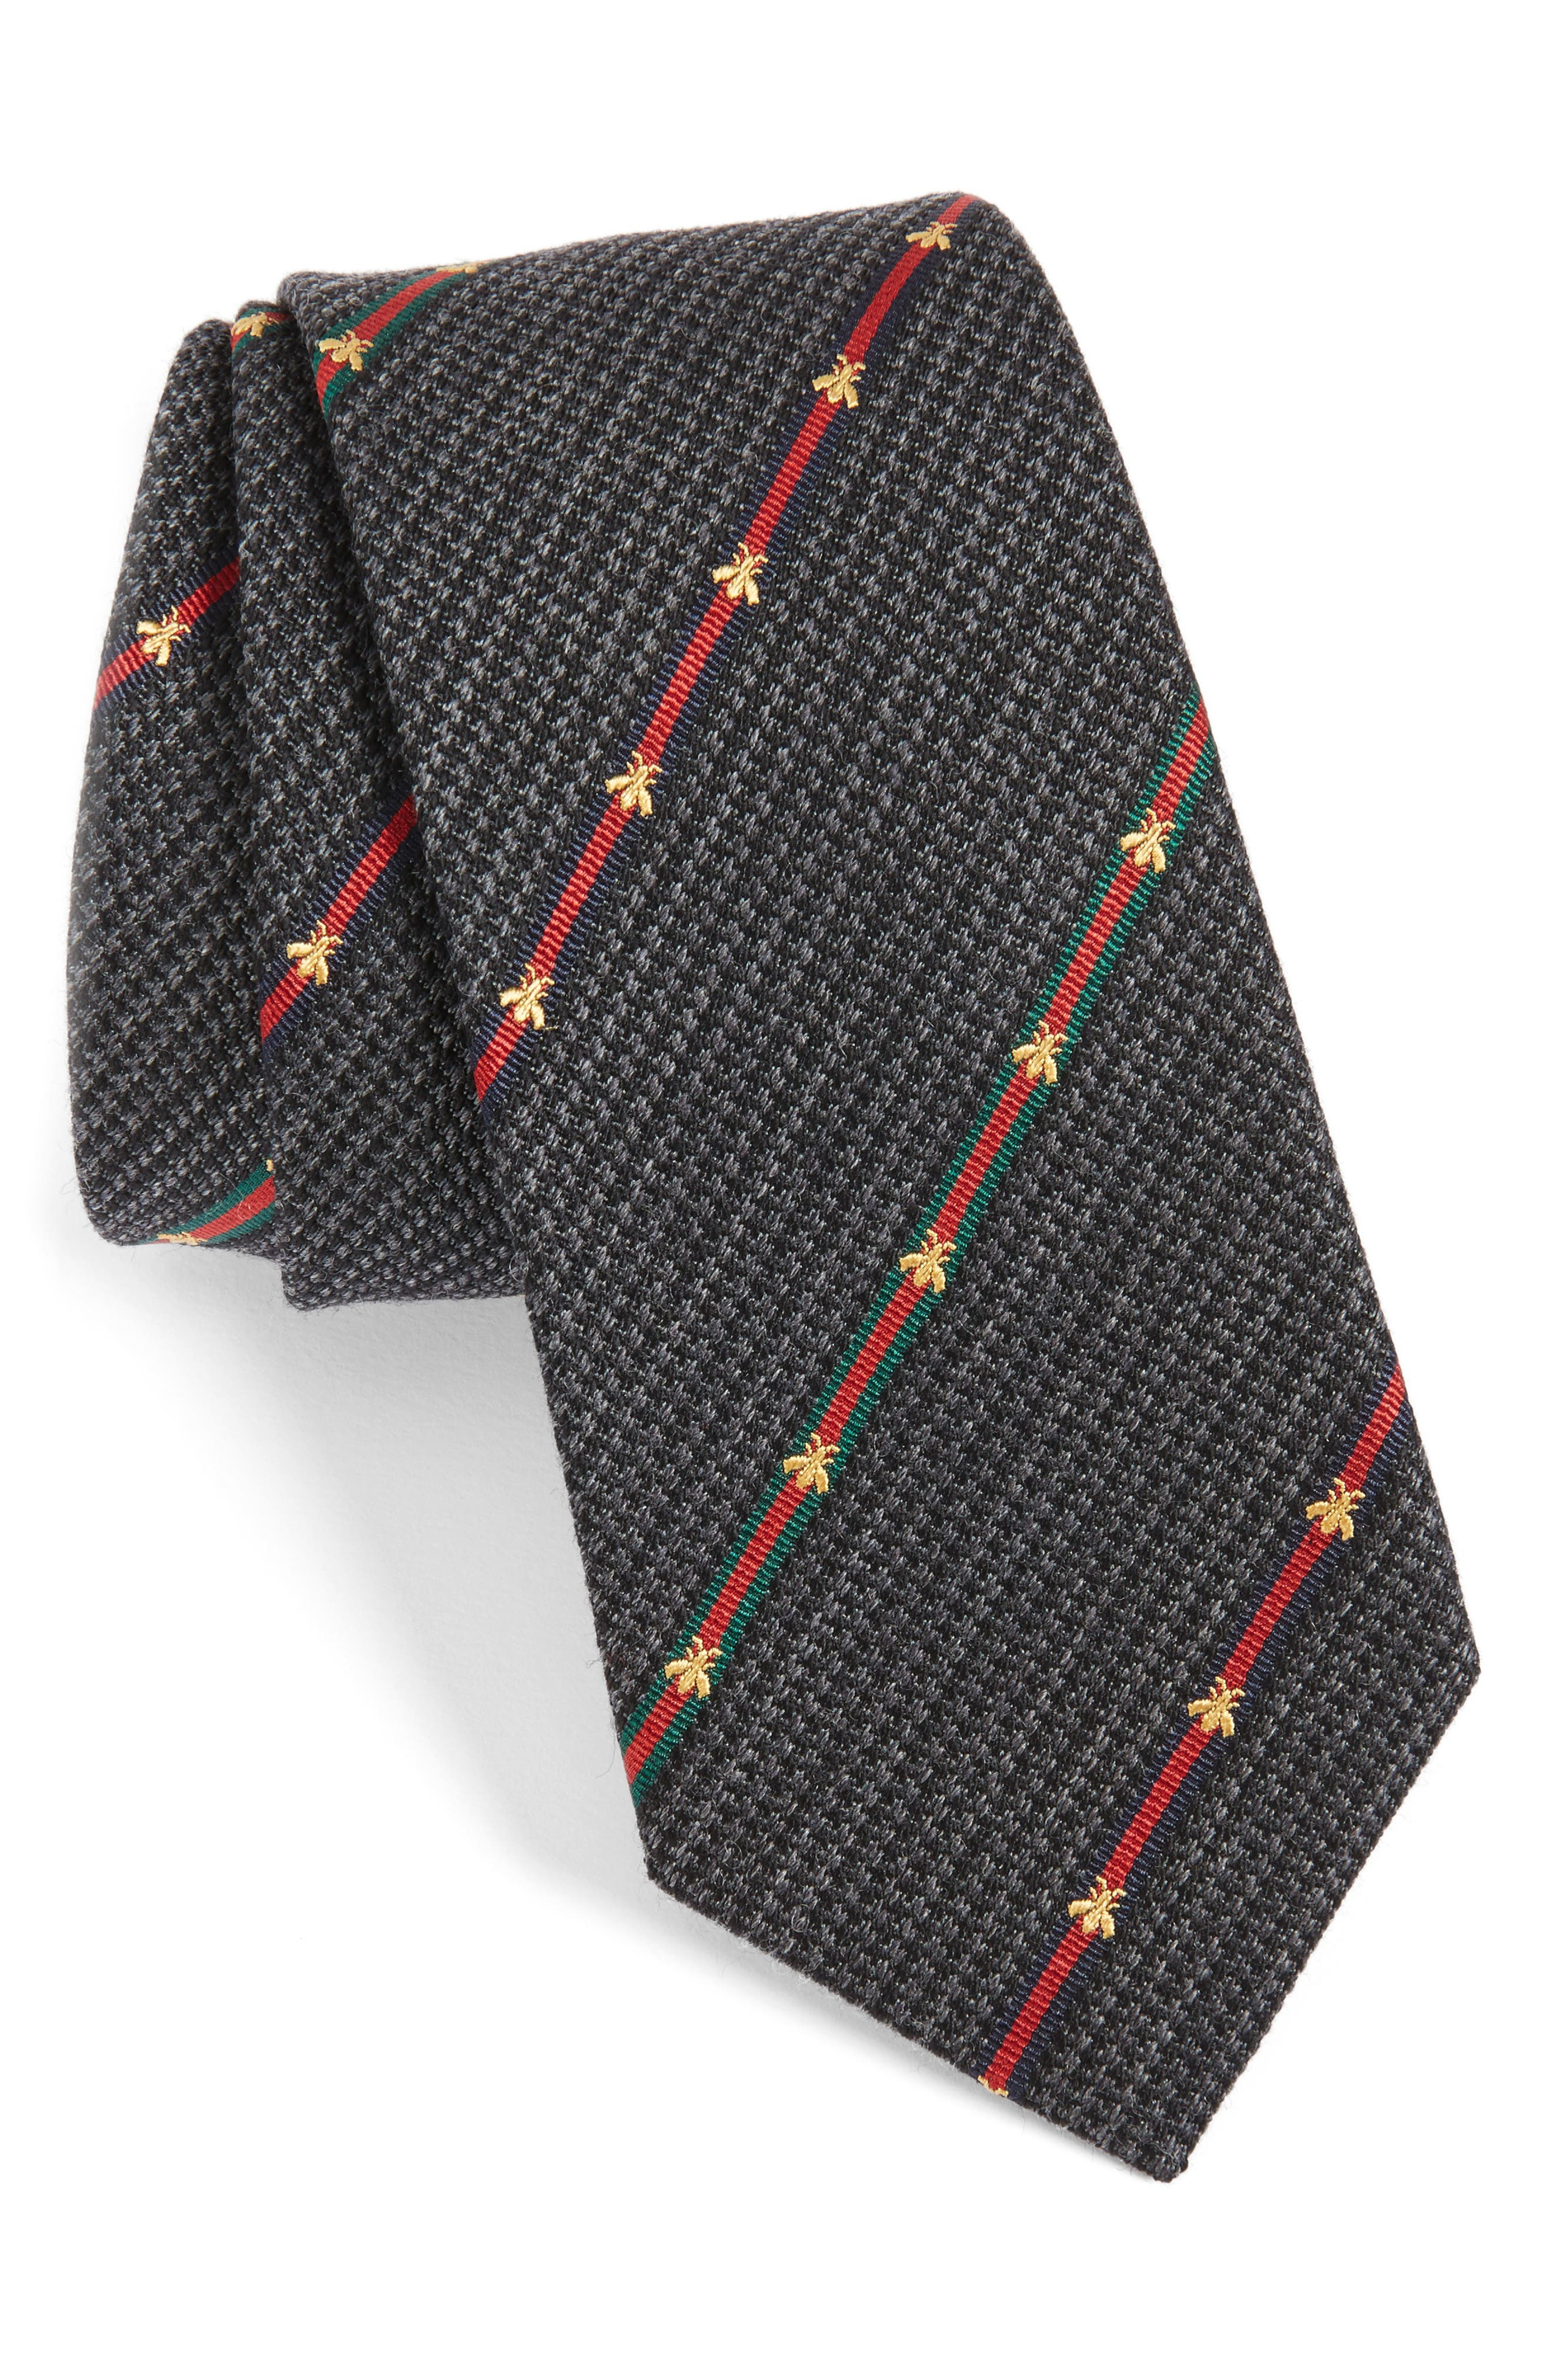 Savanur Silk & Wool Tie,                             Main thumbnail 1, color,                             003